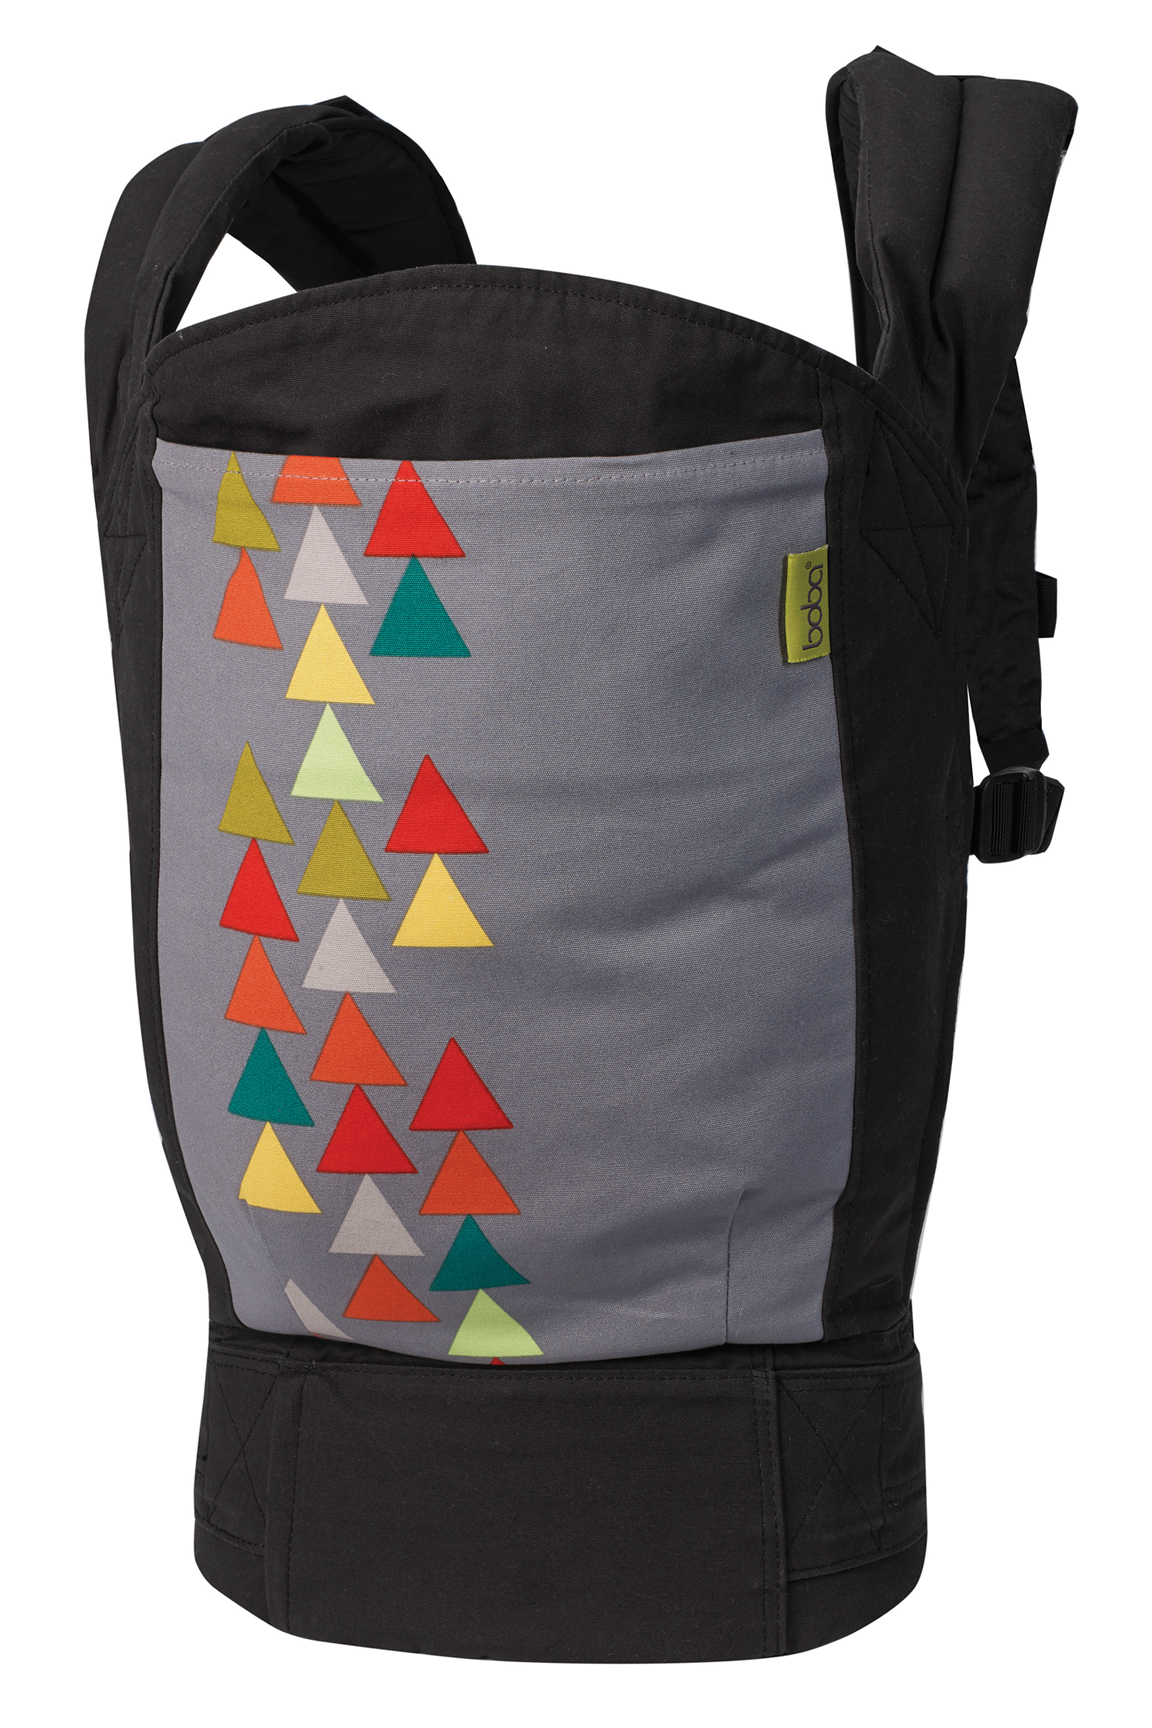 Boba Эрго-рюкзак Carrier Peak